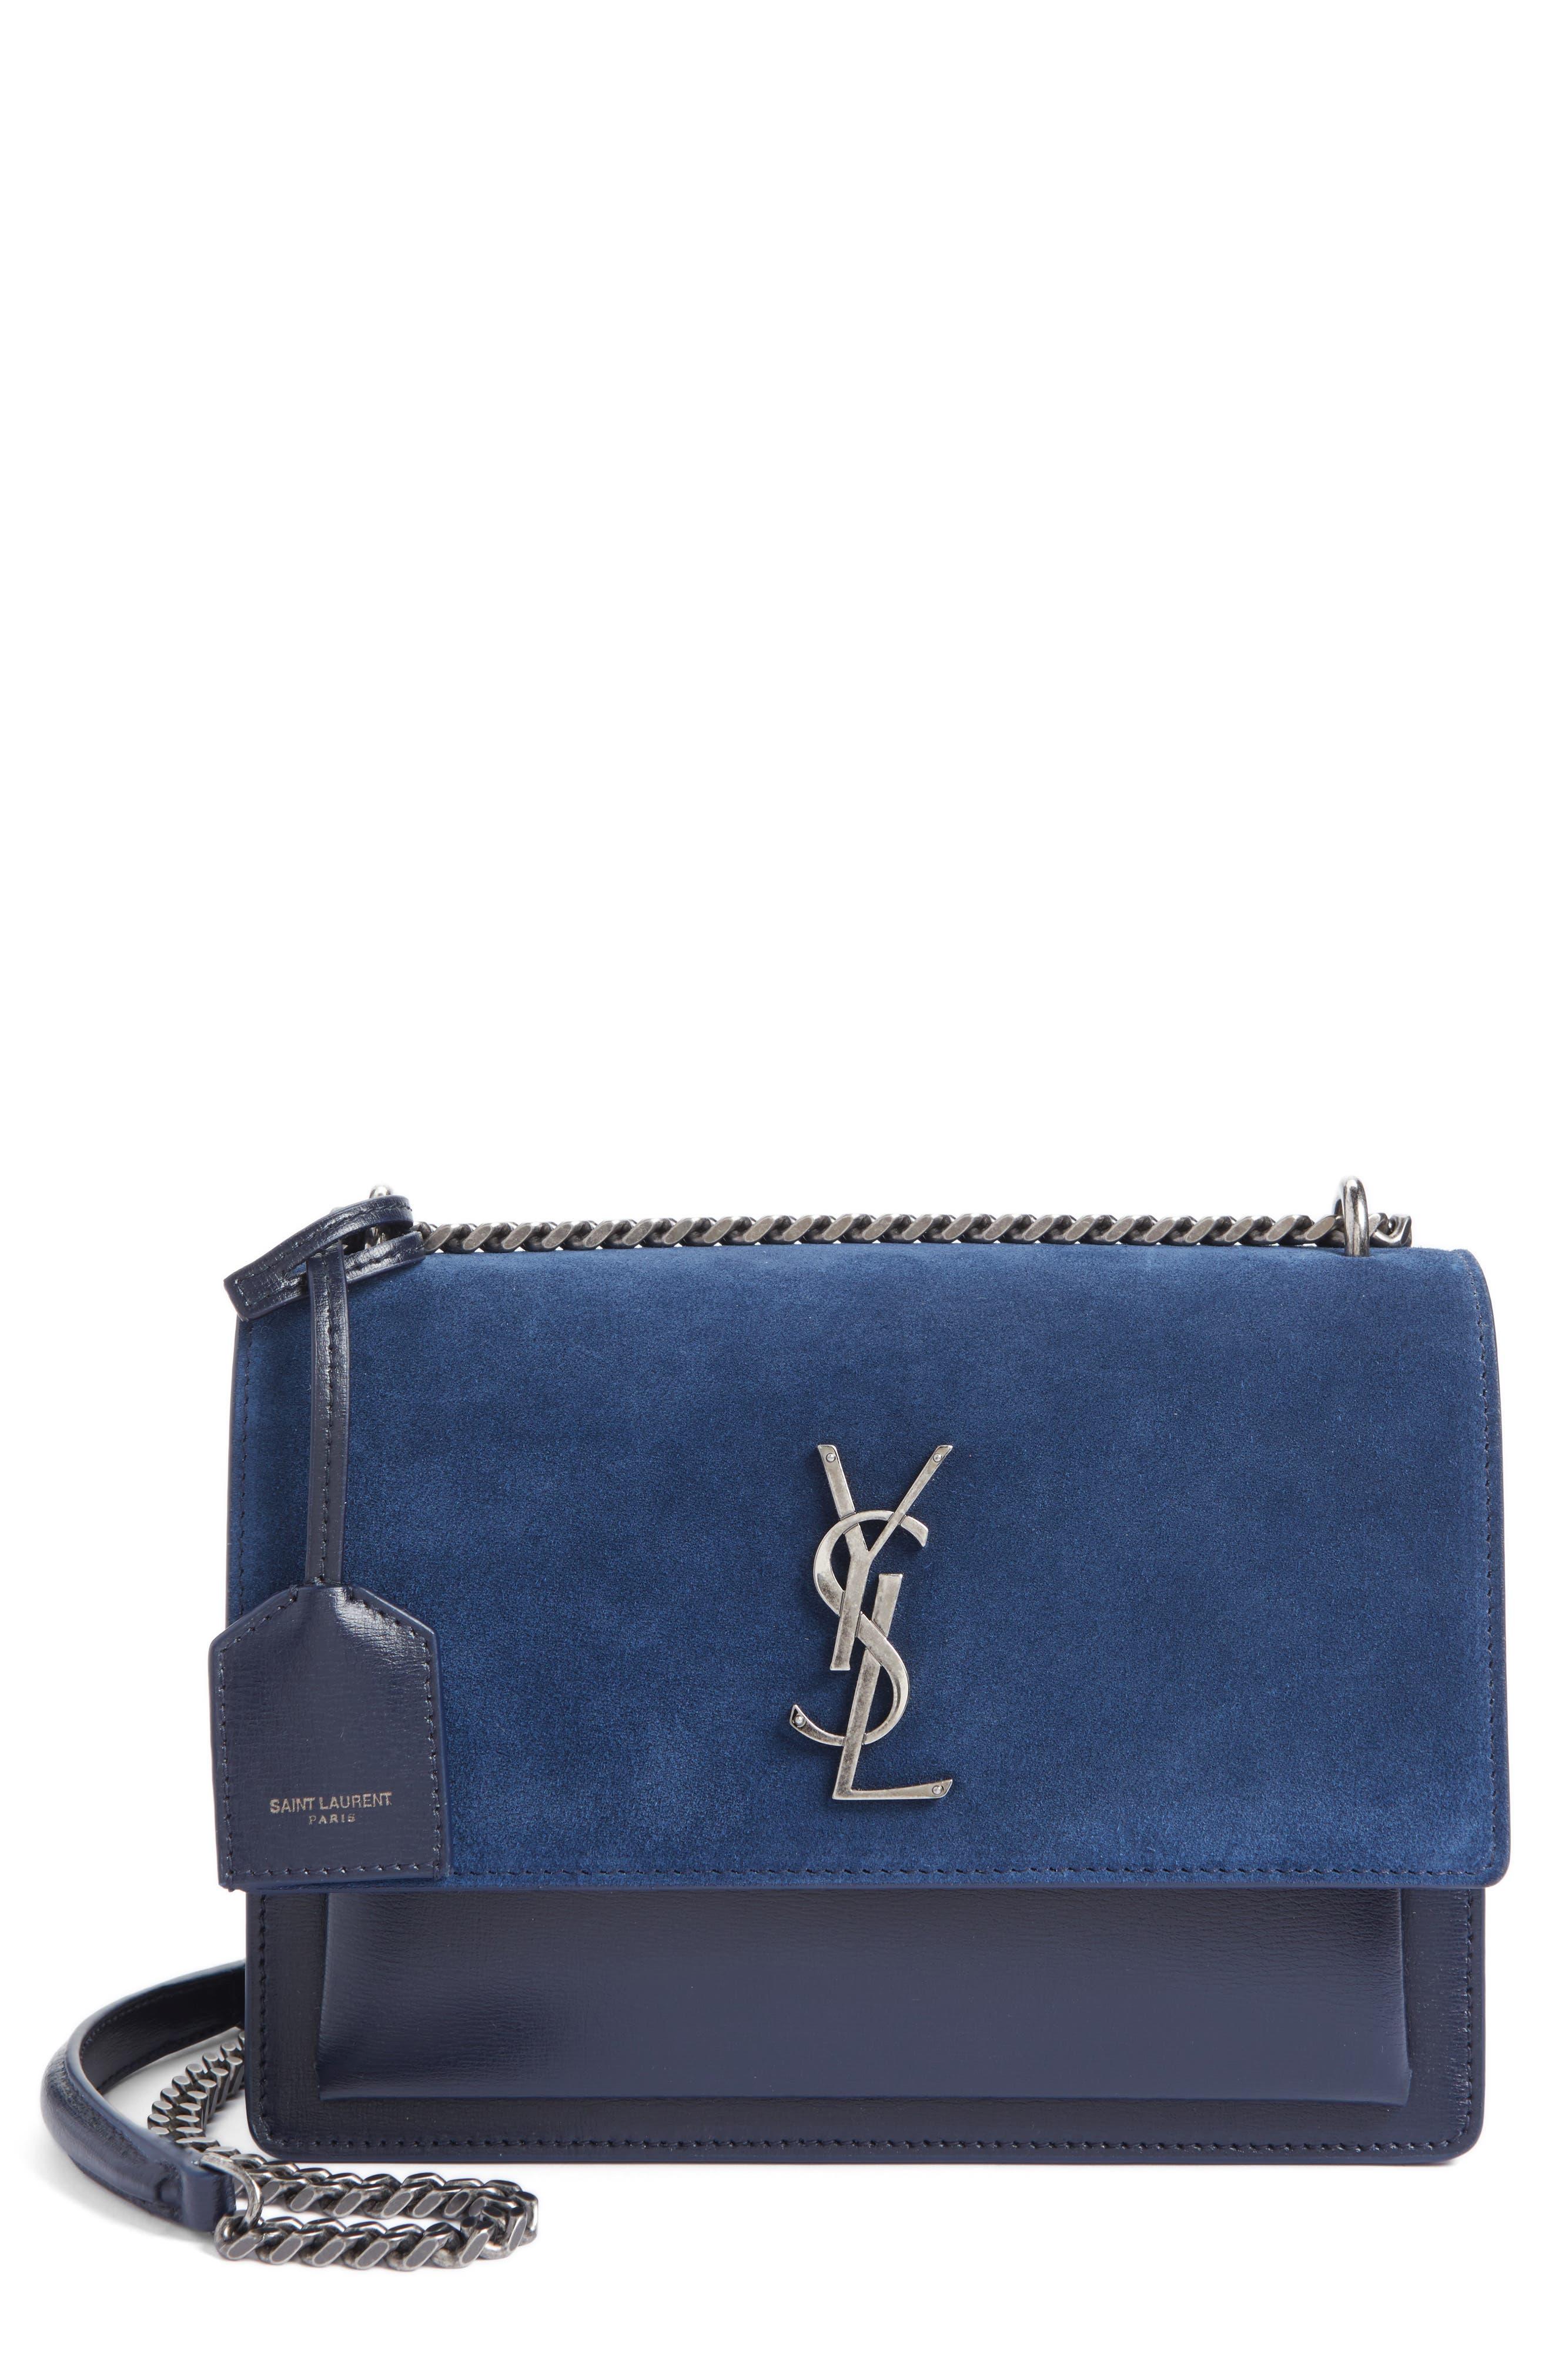 Main Image - Saint Laurent Medium Sunset Leather & Suede Shoulder Bag